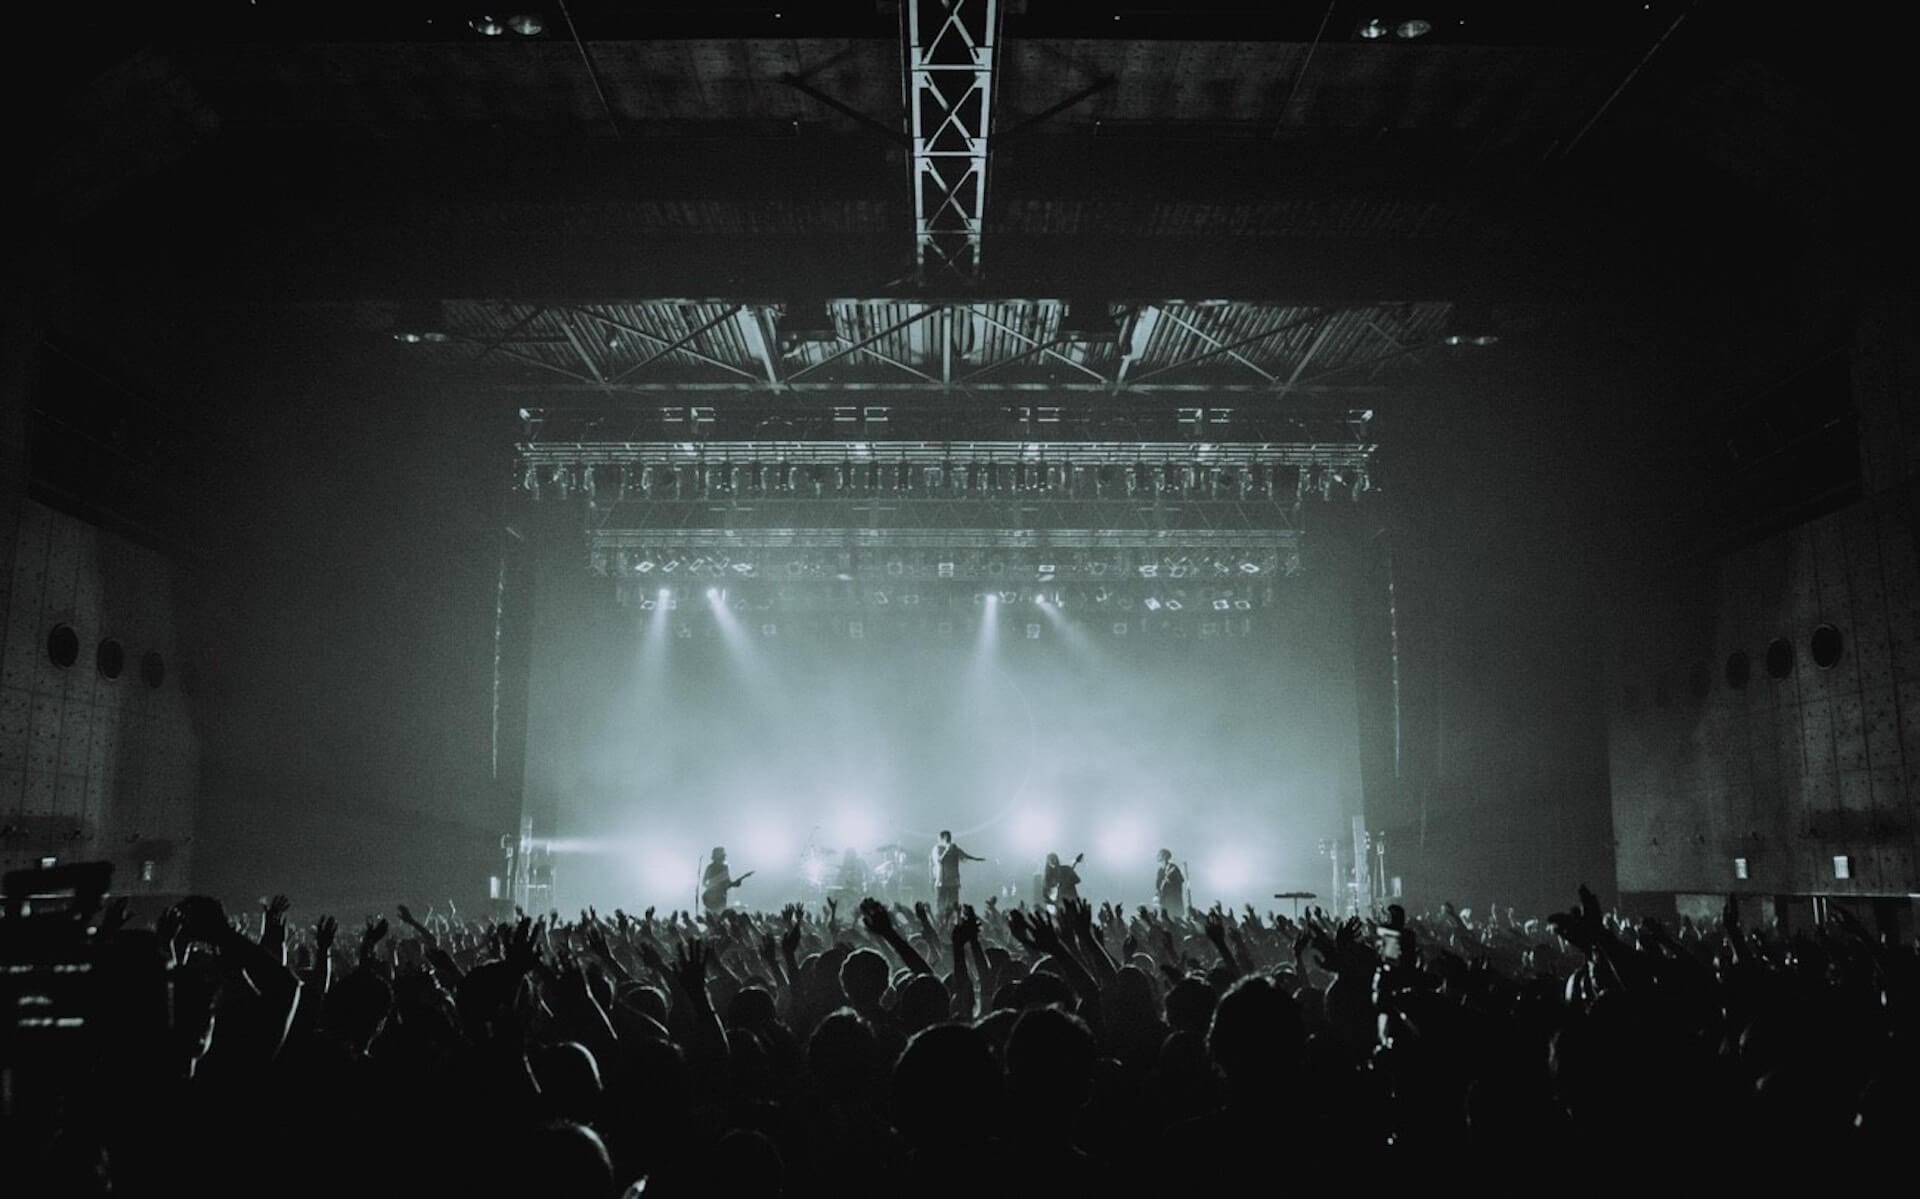 Survive Said The Prophetライブレポート|ワールドツアー直前!観客とのシンガロングで作り上げた奇跡の一夜 SSTP_10